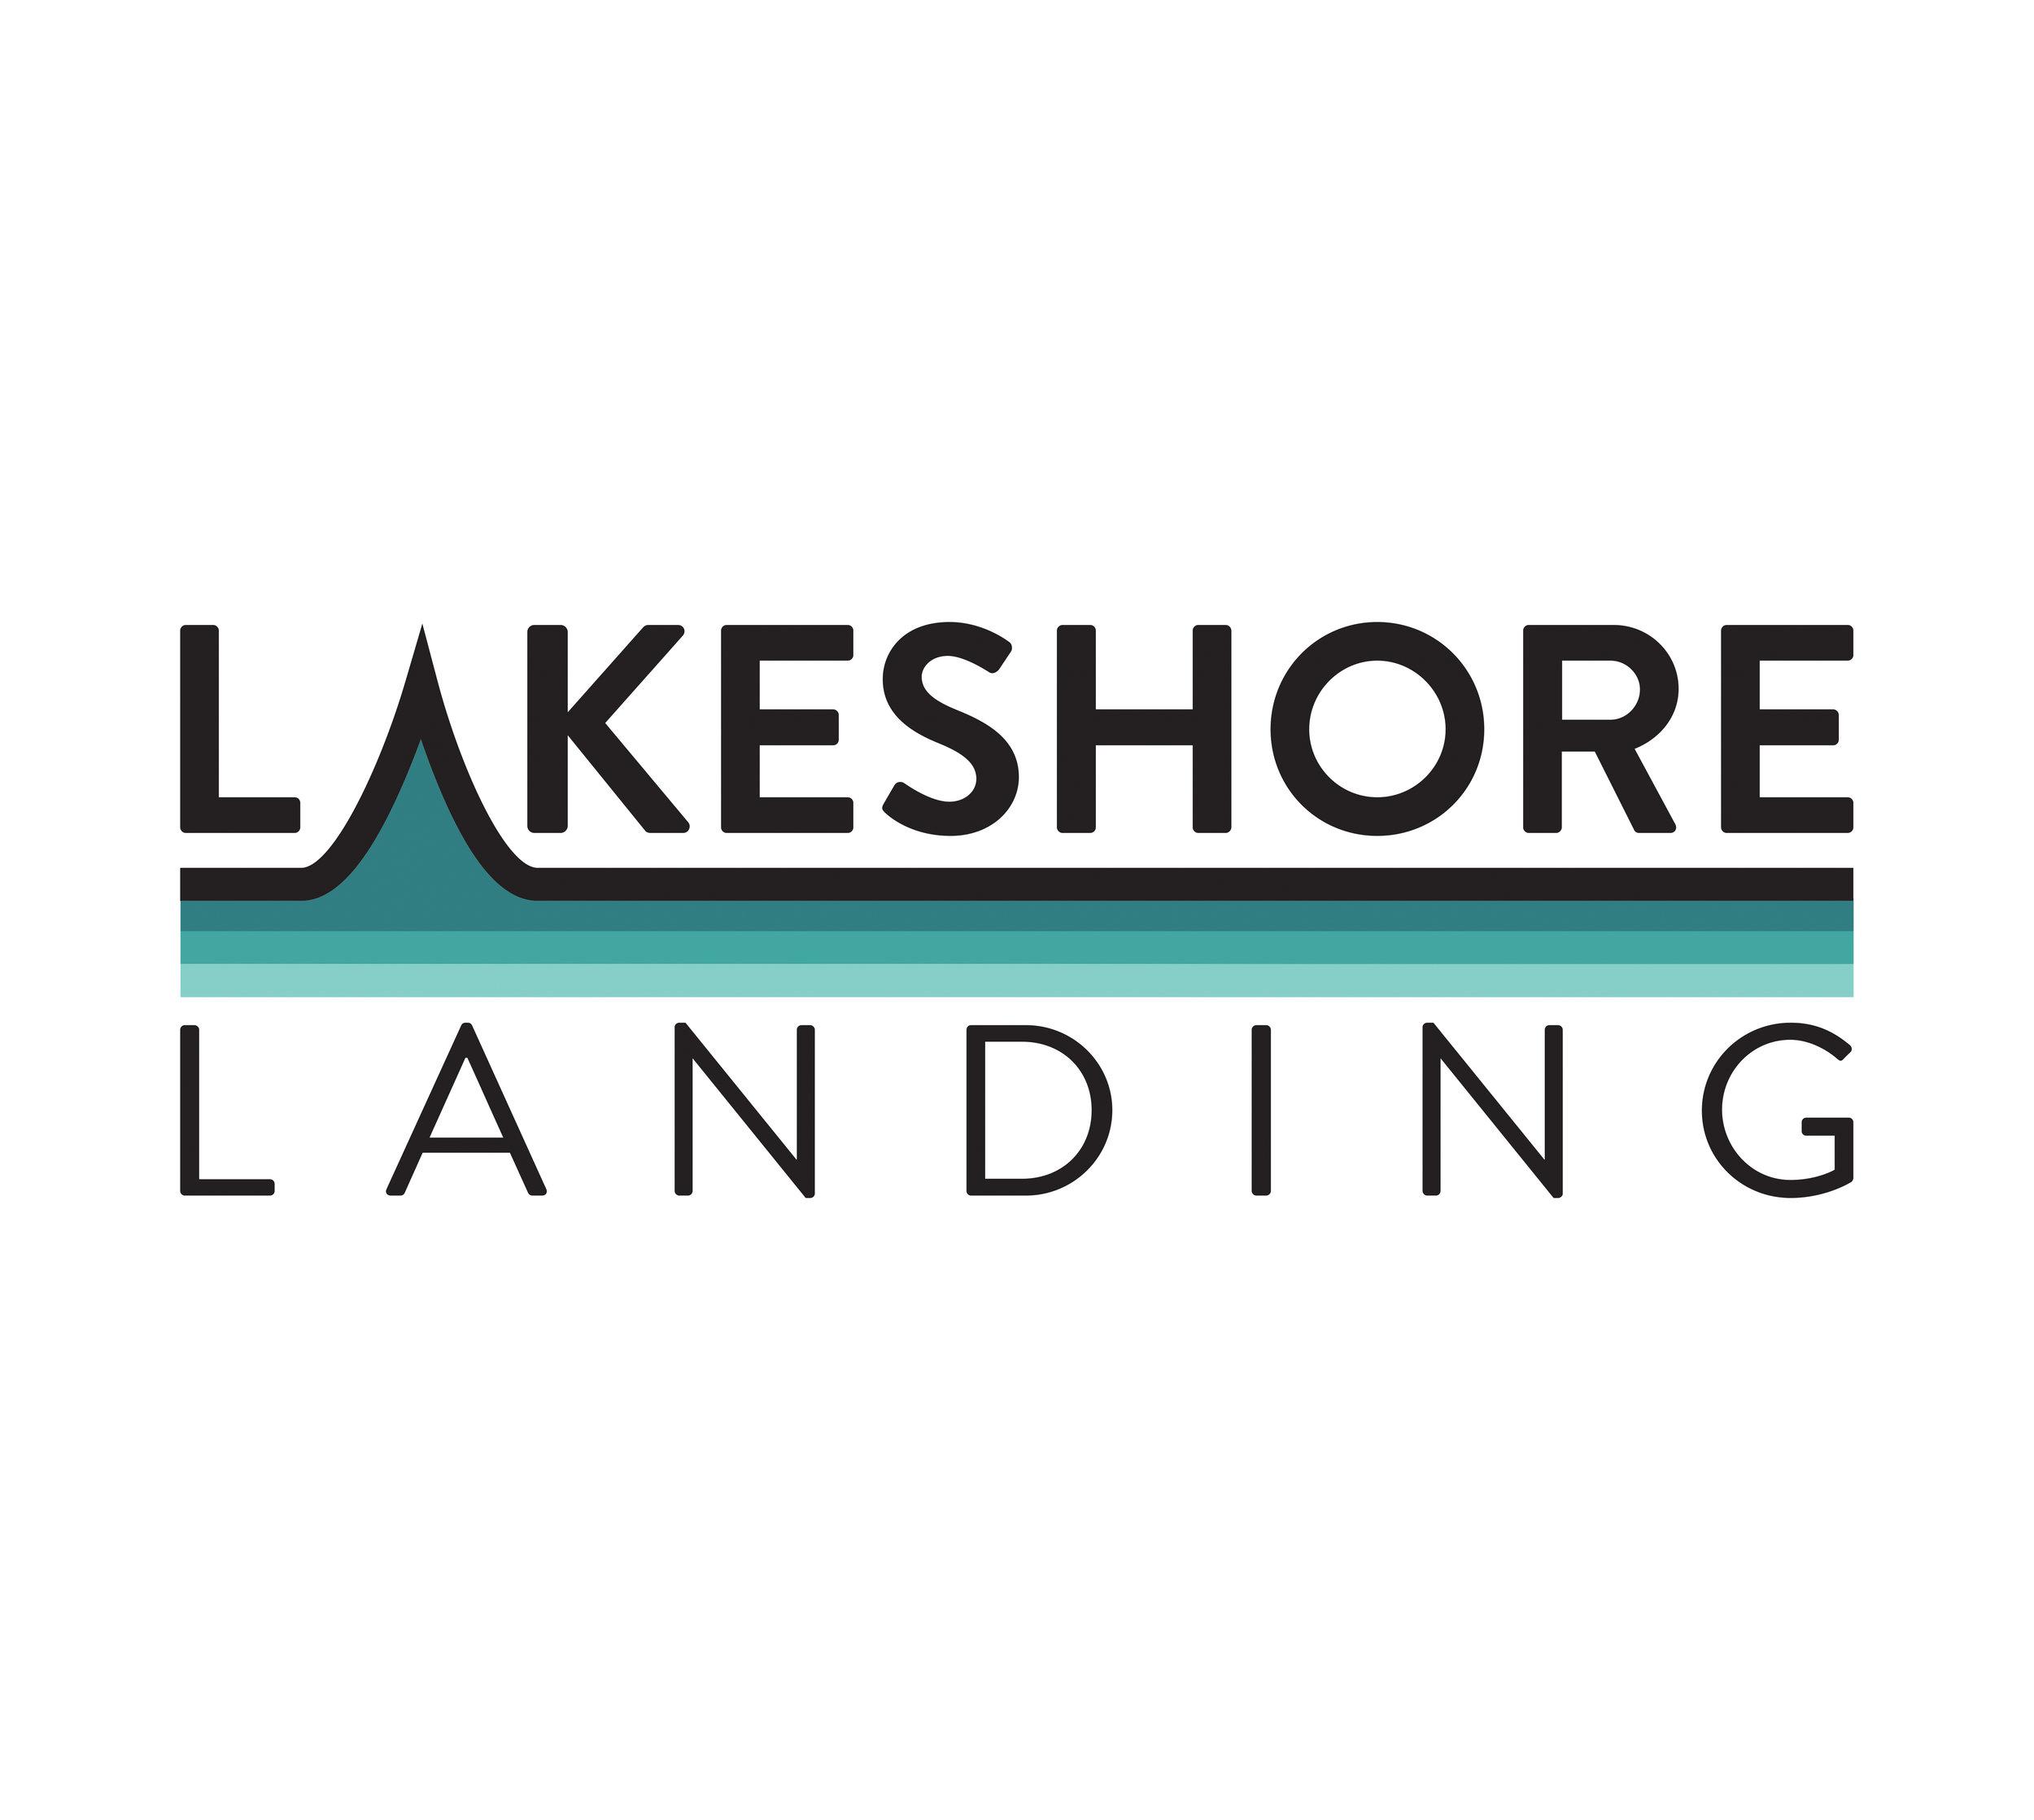 calendar lakeshore landing rh lakeshorelandingnola com lakeshore entertainment logo wikia lakeshore entertainment logo 2005